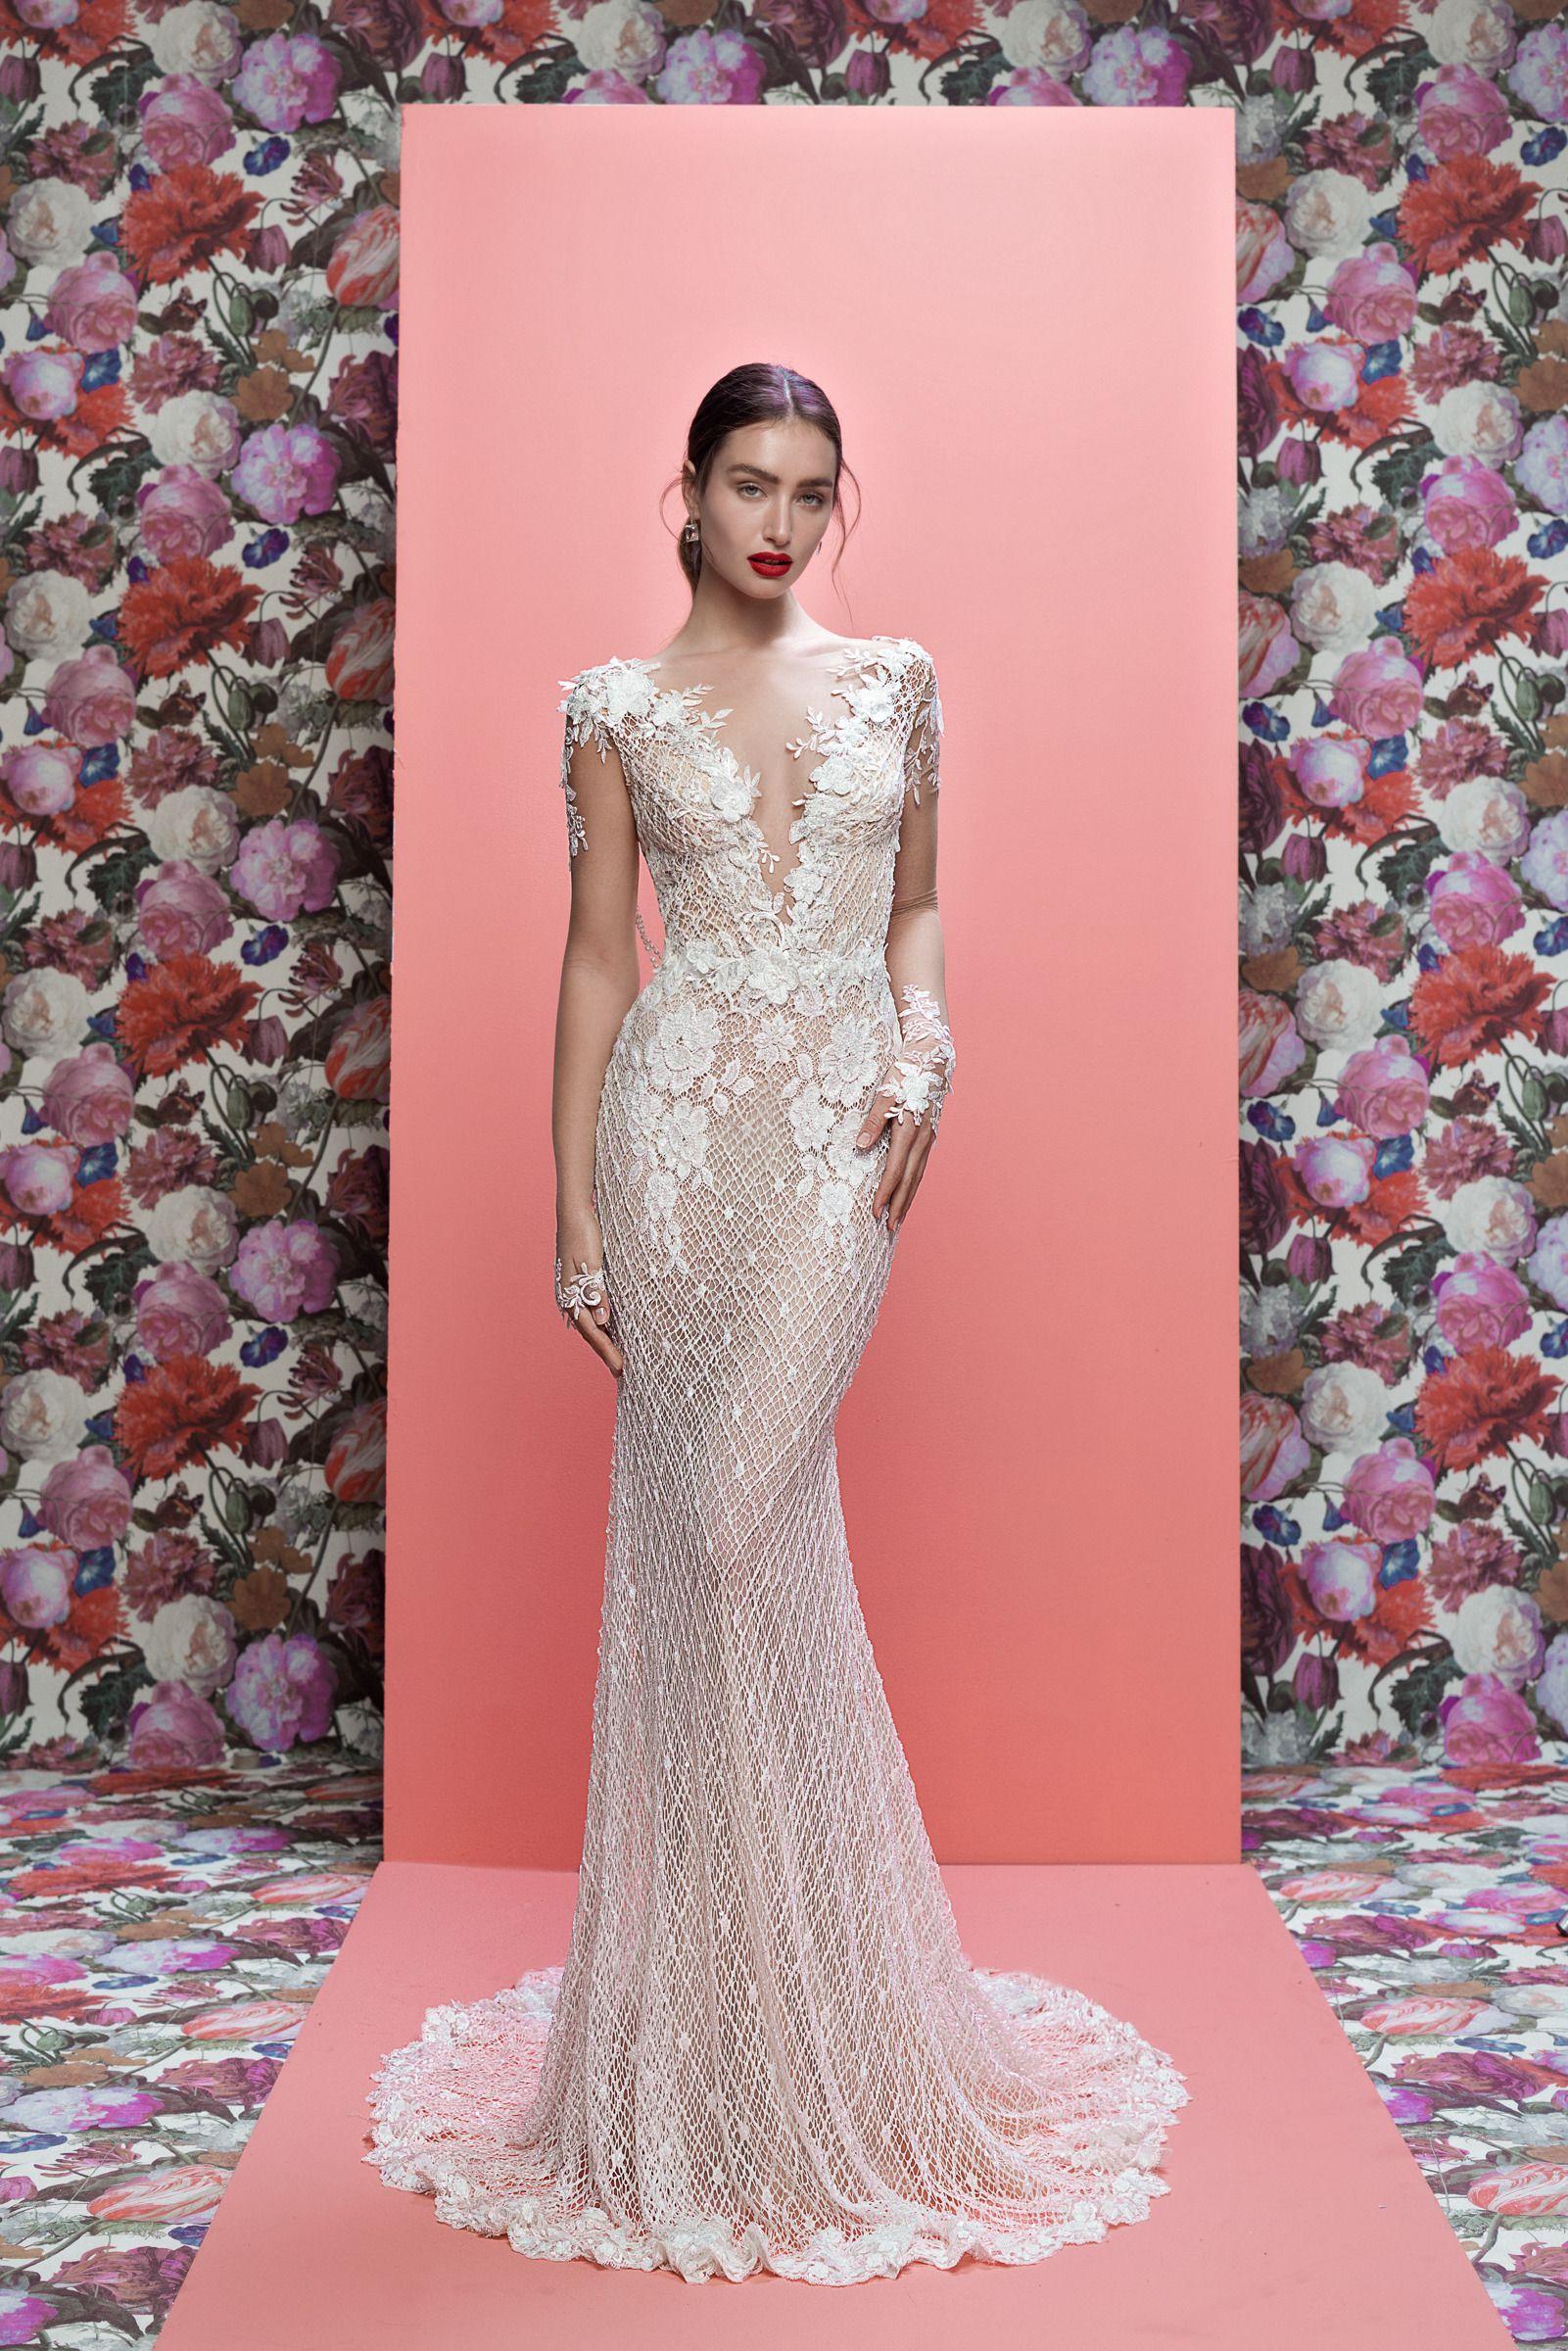 Asombroso Blake Animado Vestido De Novia Viñeta - Colección del ...